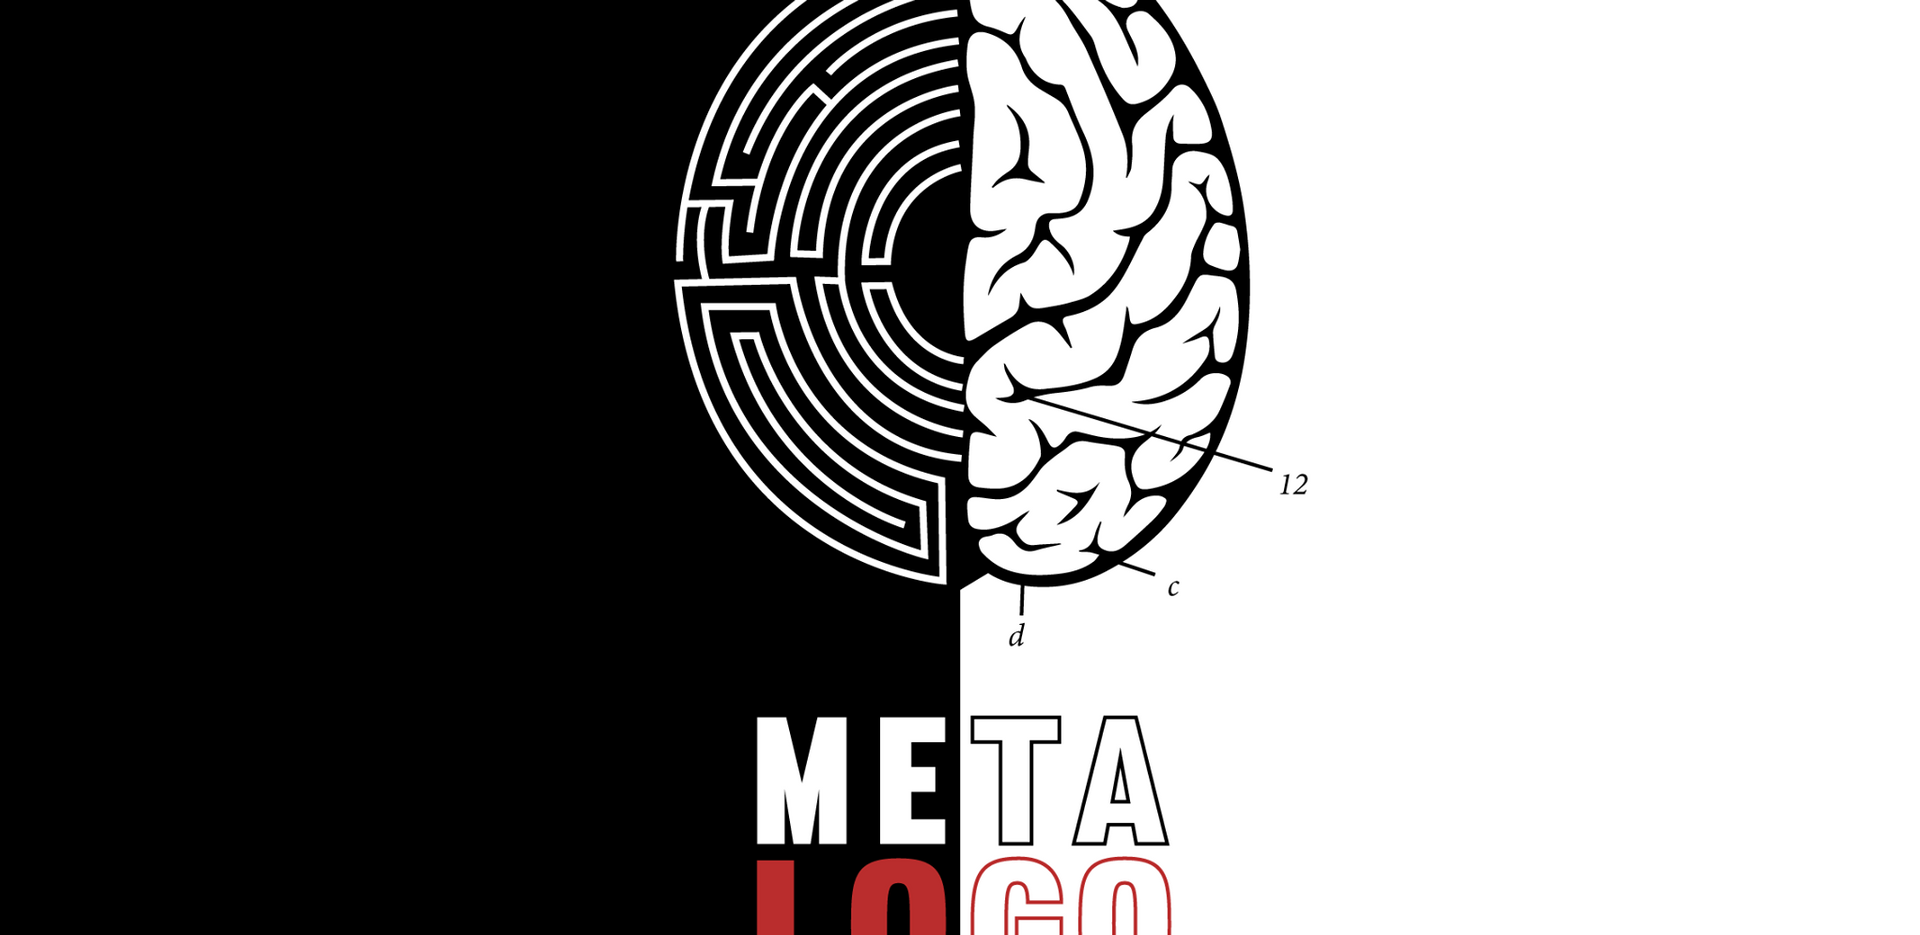 METALOGO